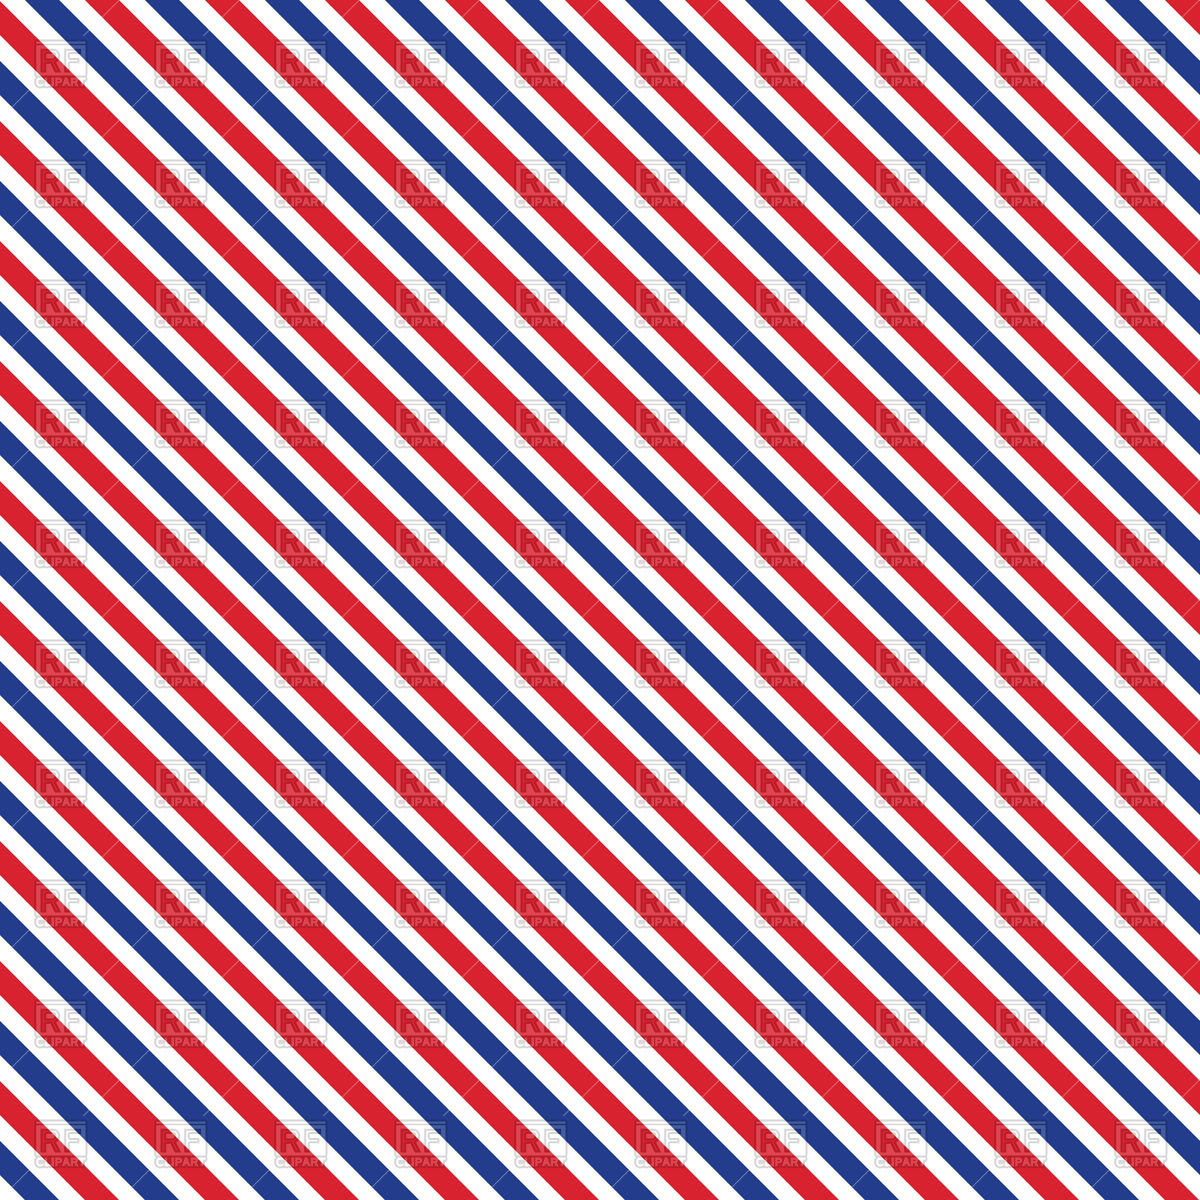 stripe textile background clipart clipground